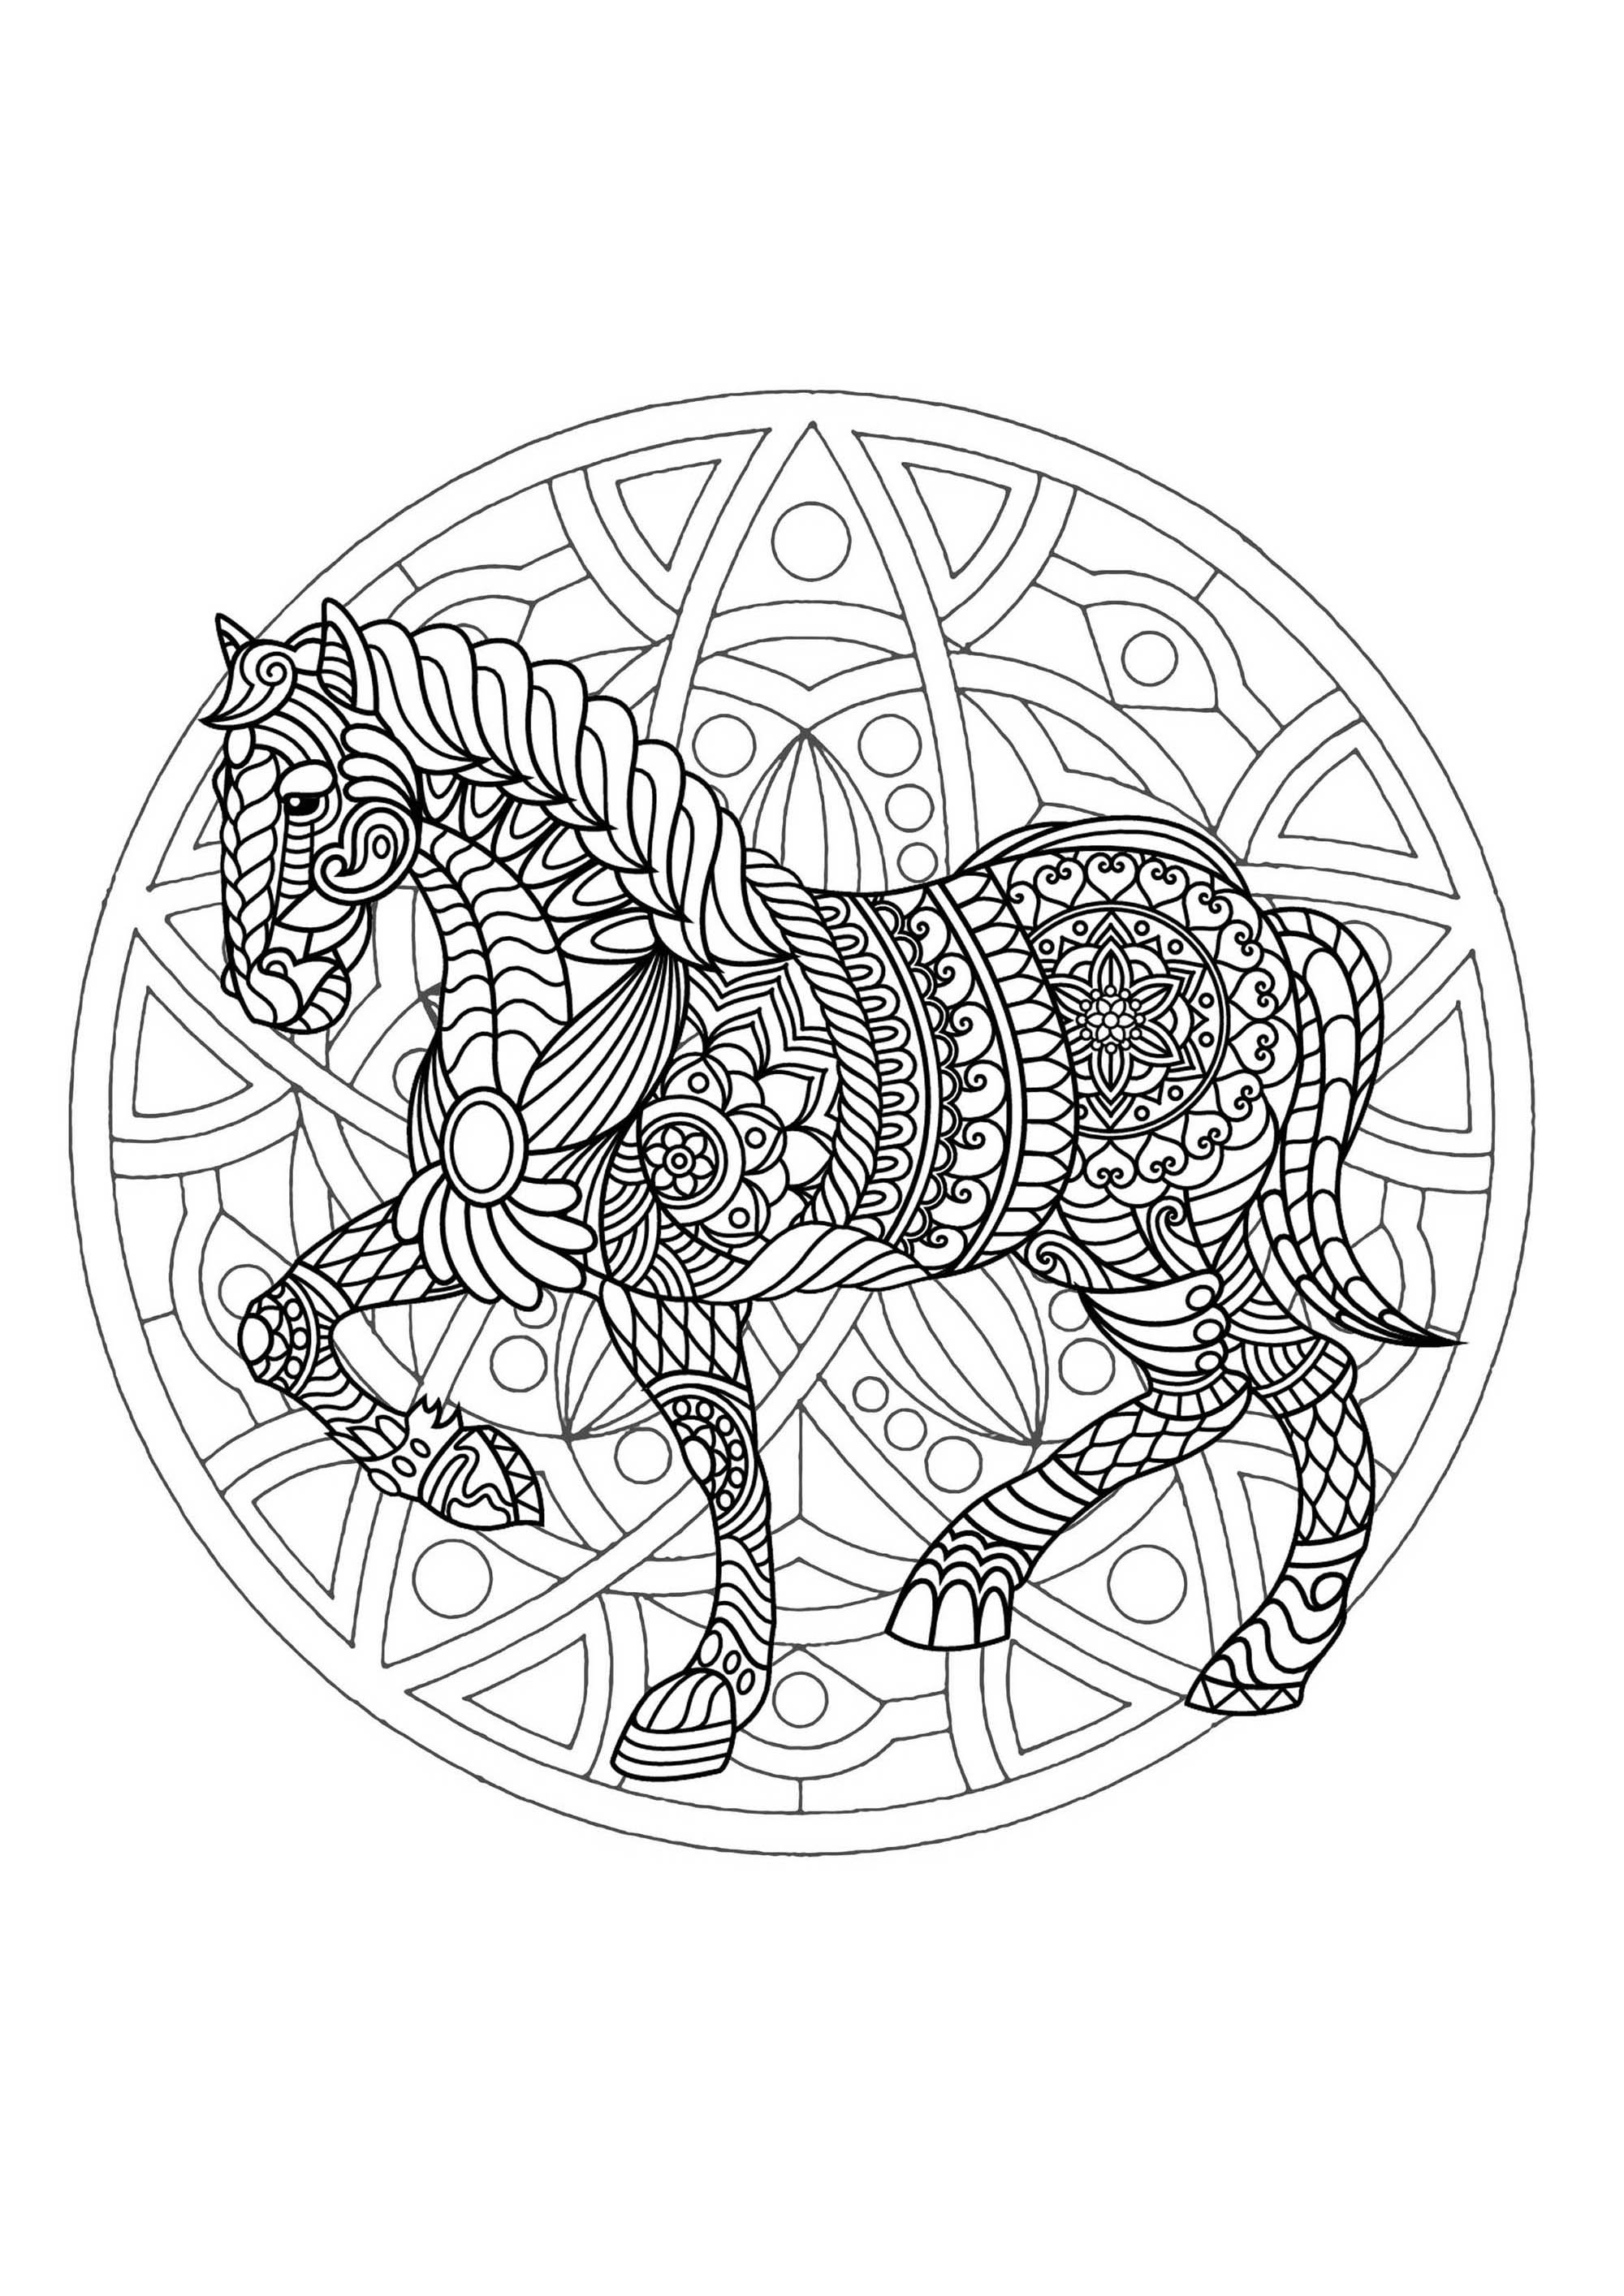 Mandala gratuit cheval coloriage mandalas coloriages - Coloriage a imprimer mandala gratuit ...